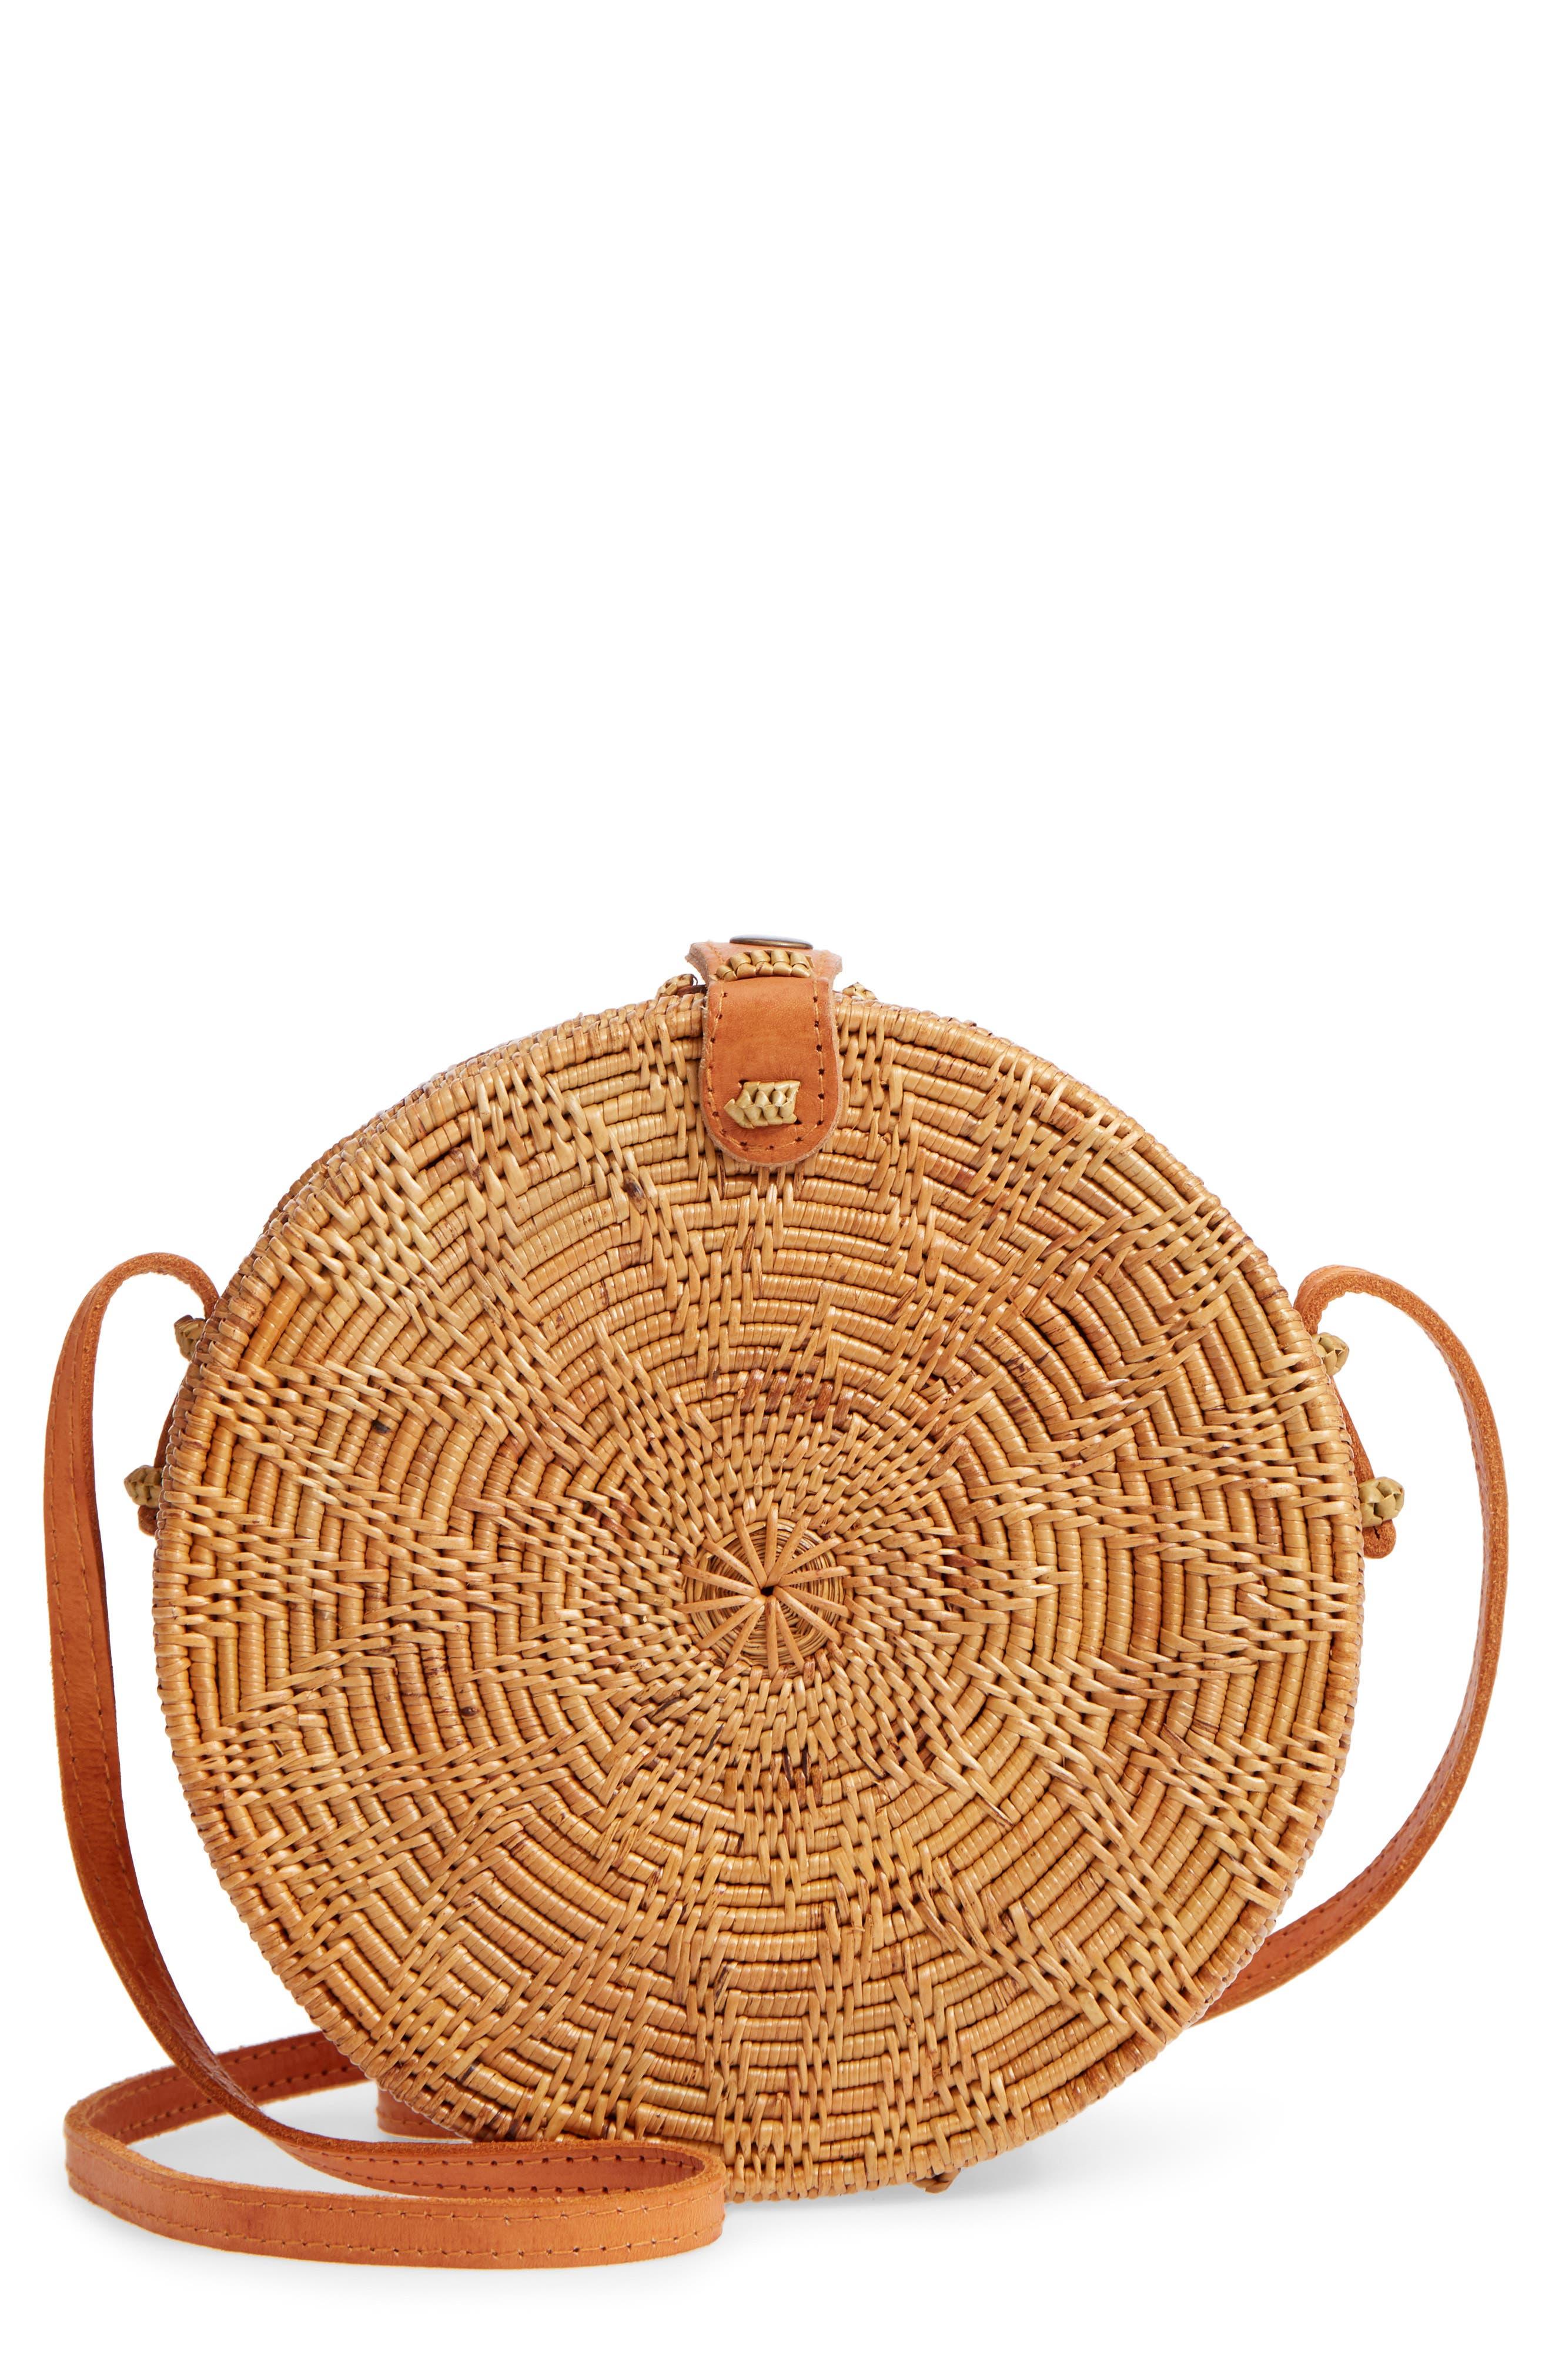 Woven Rattan Circle Basket Crossbody,                             Main thumbnail 1, color,                             Tan